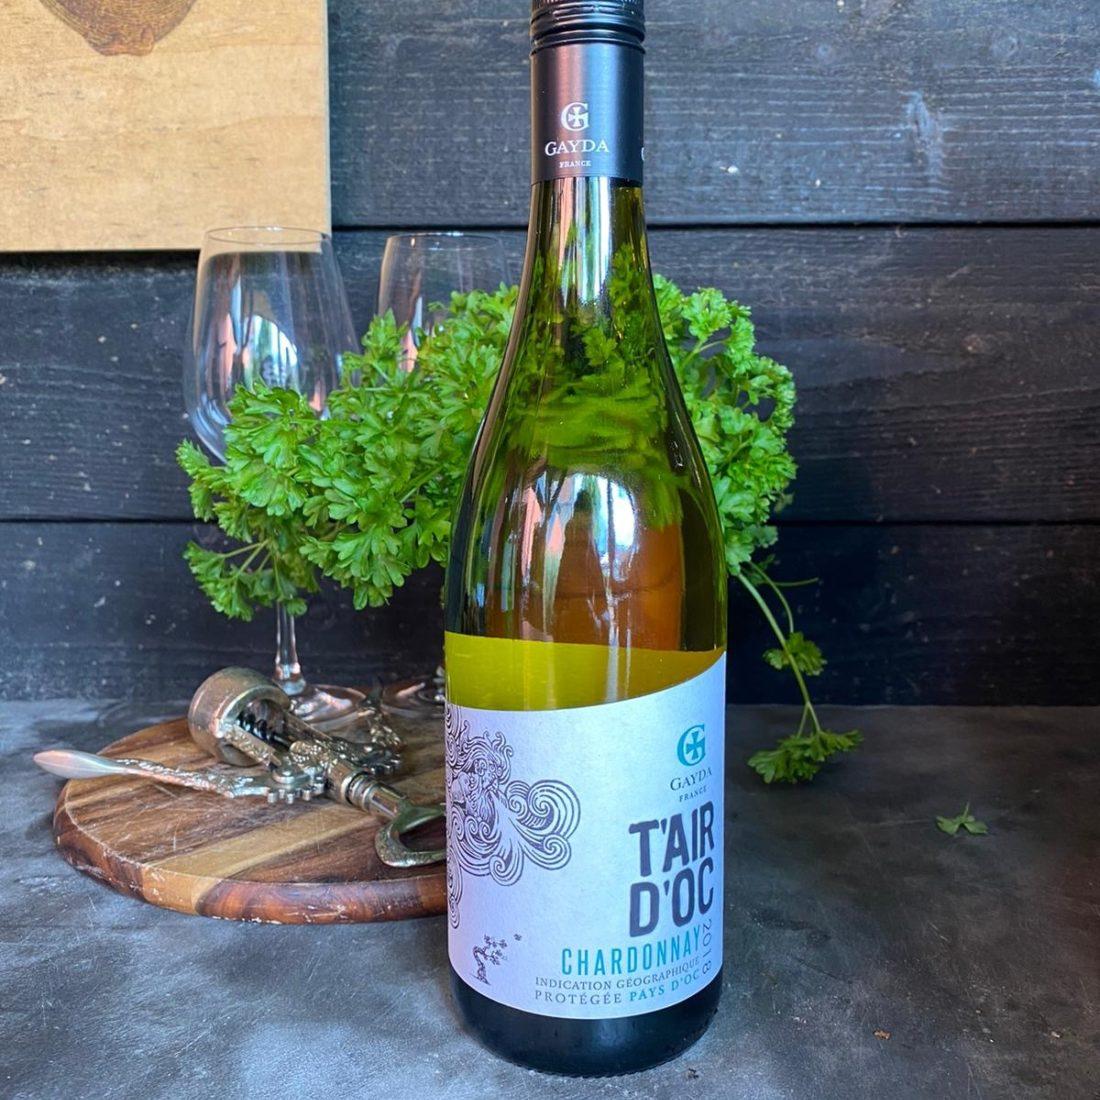 T'Air D'oc Chardonnay